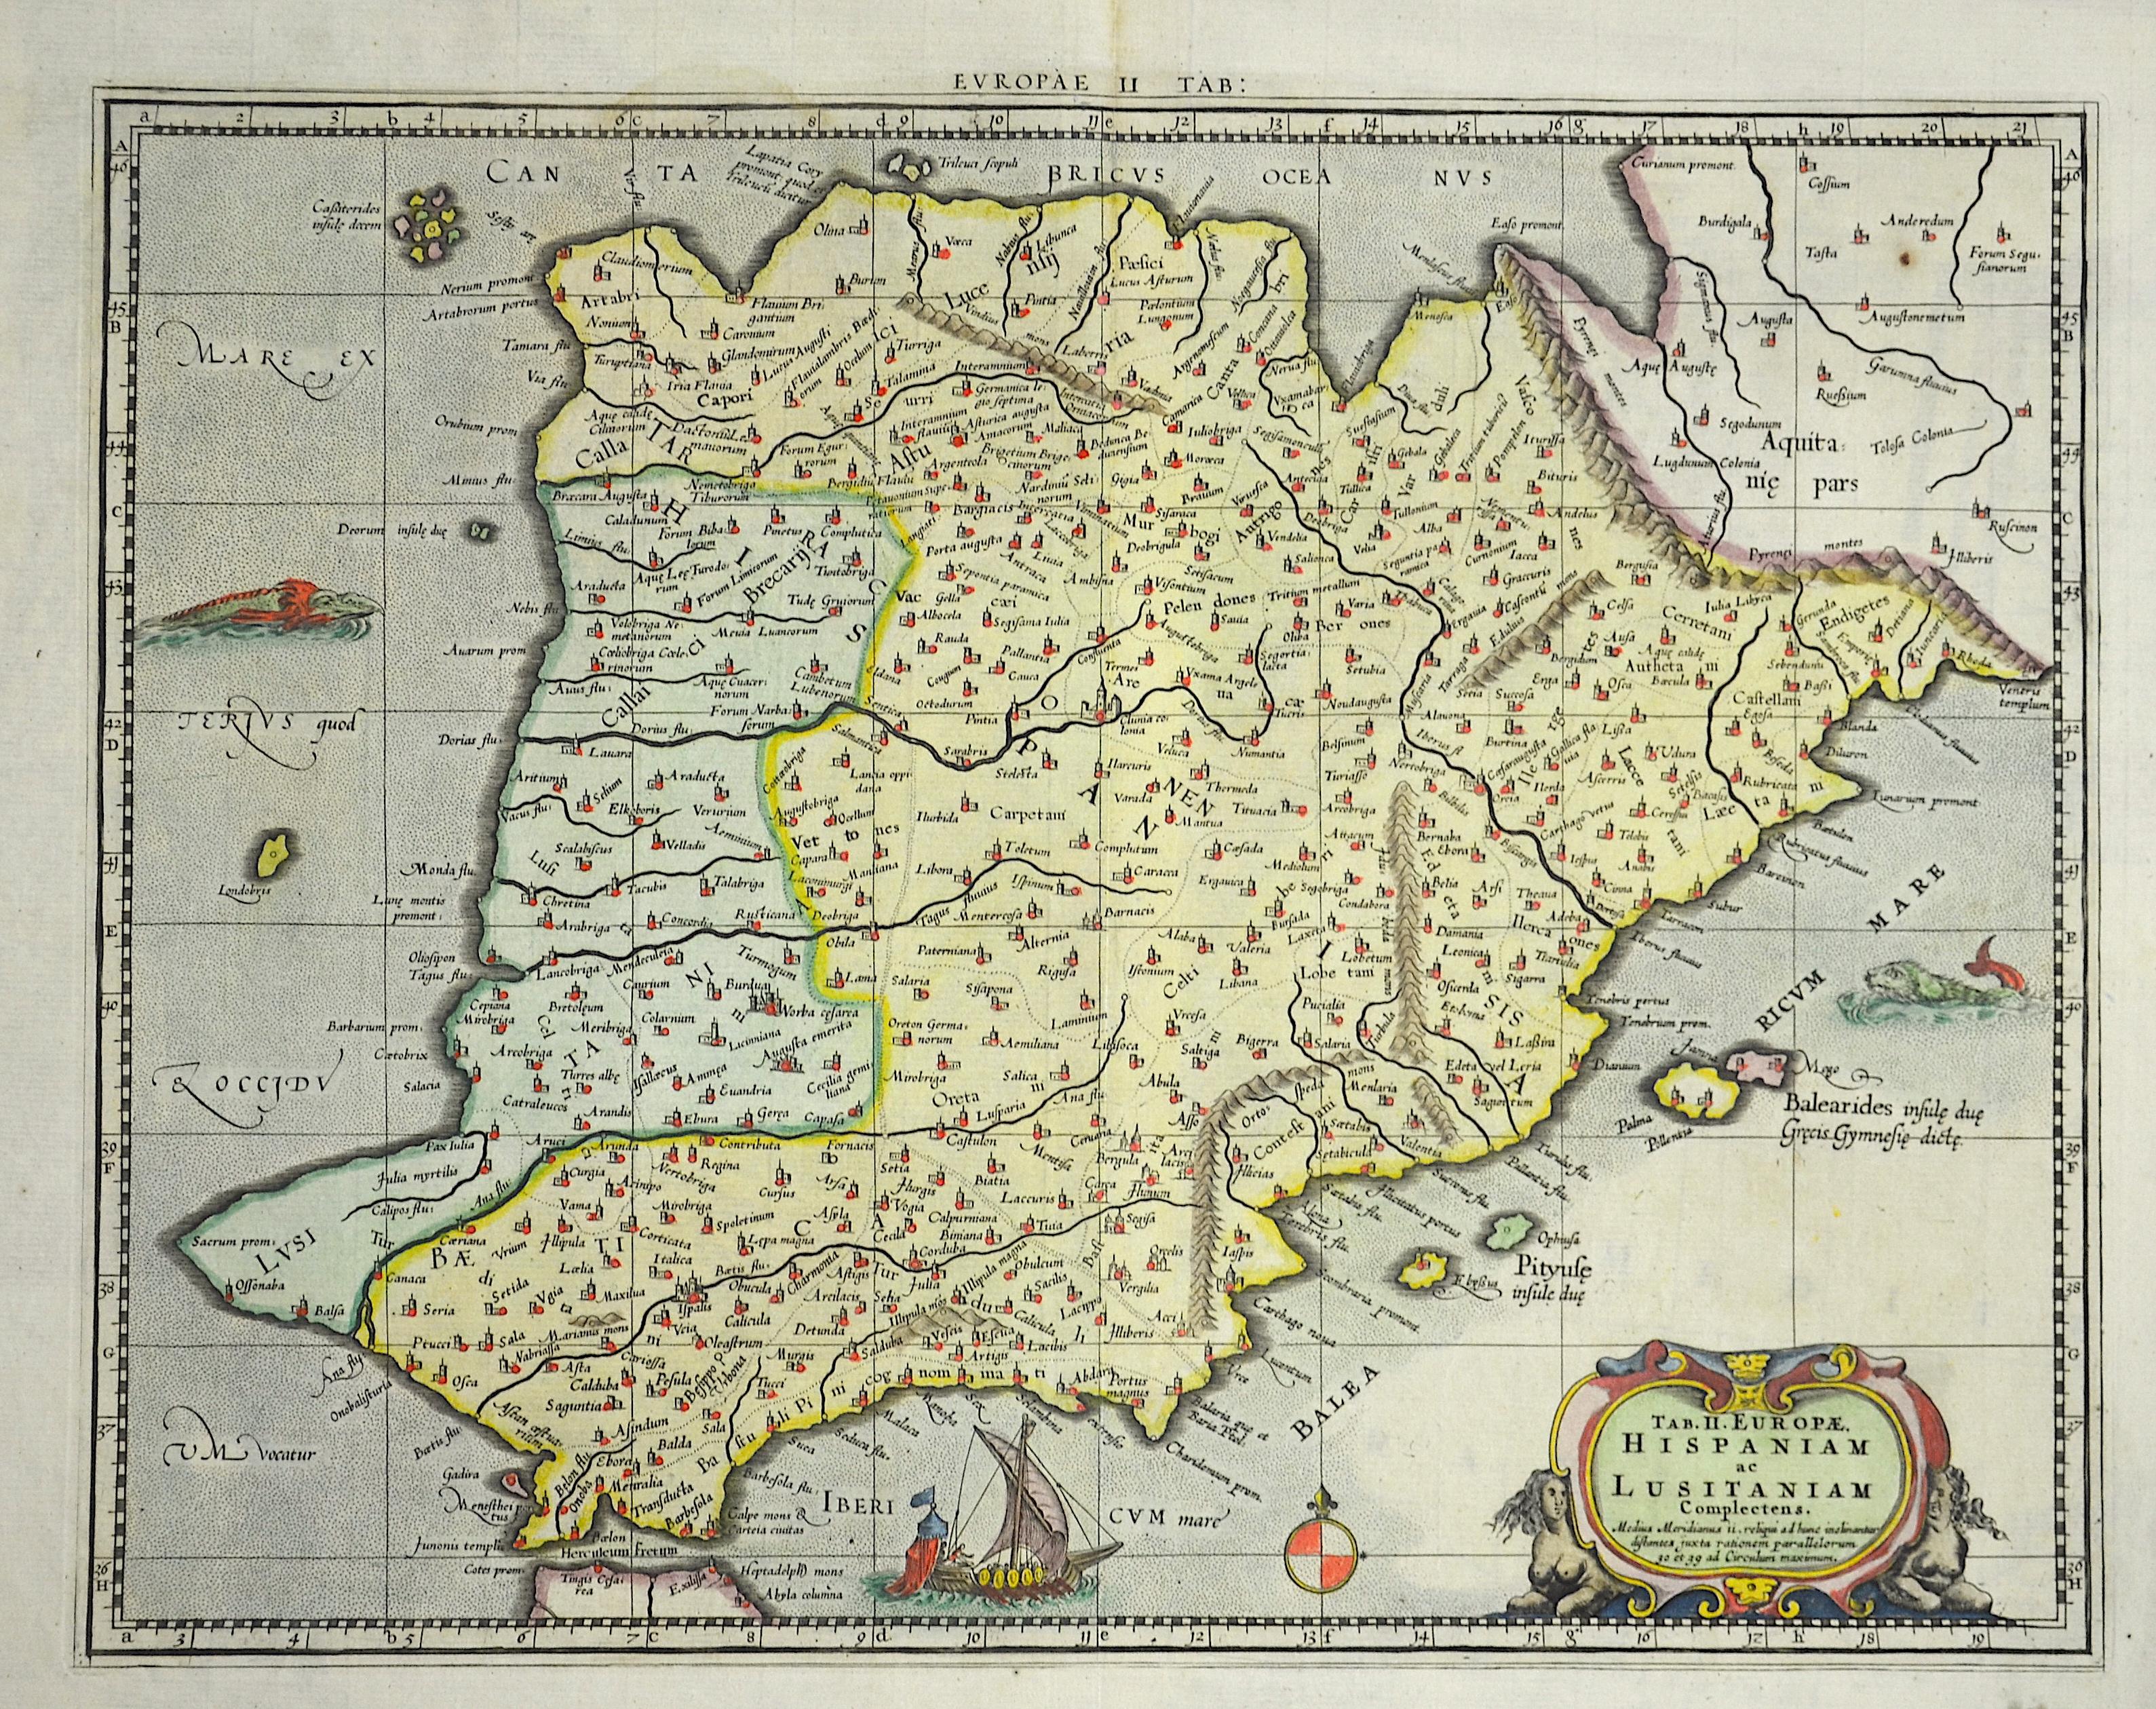 Ptolemy/ Gerhard Mercator Claudius Tab. II. Europae, Hispaniam ac Lusitaniam Complectens.